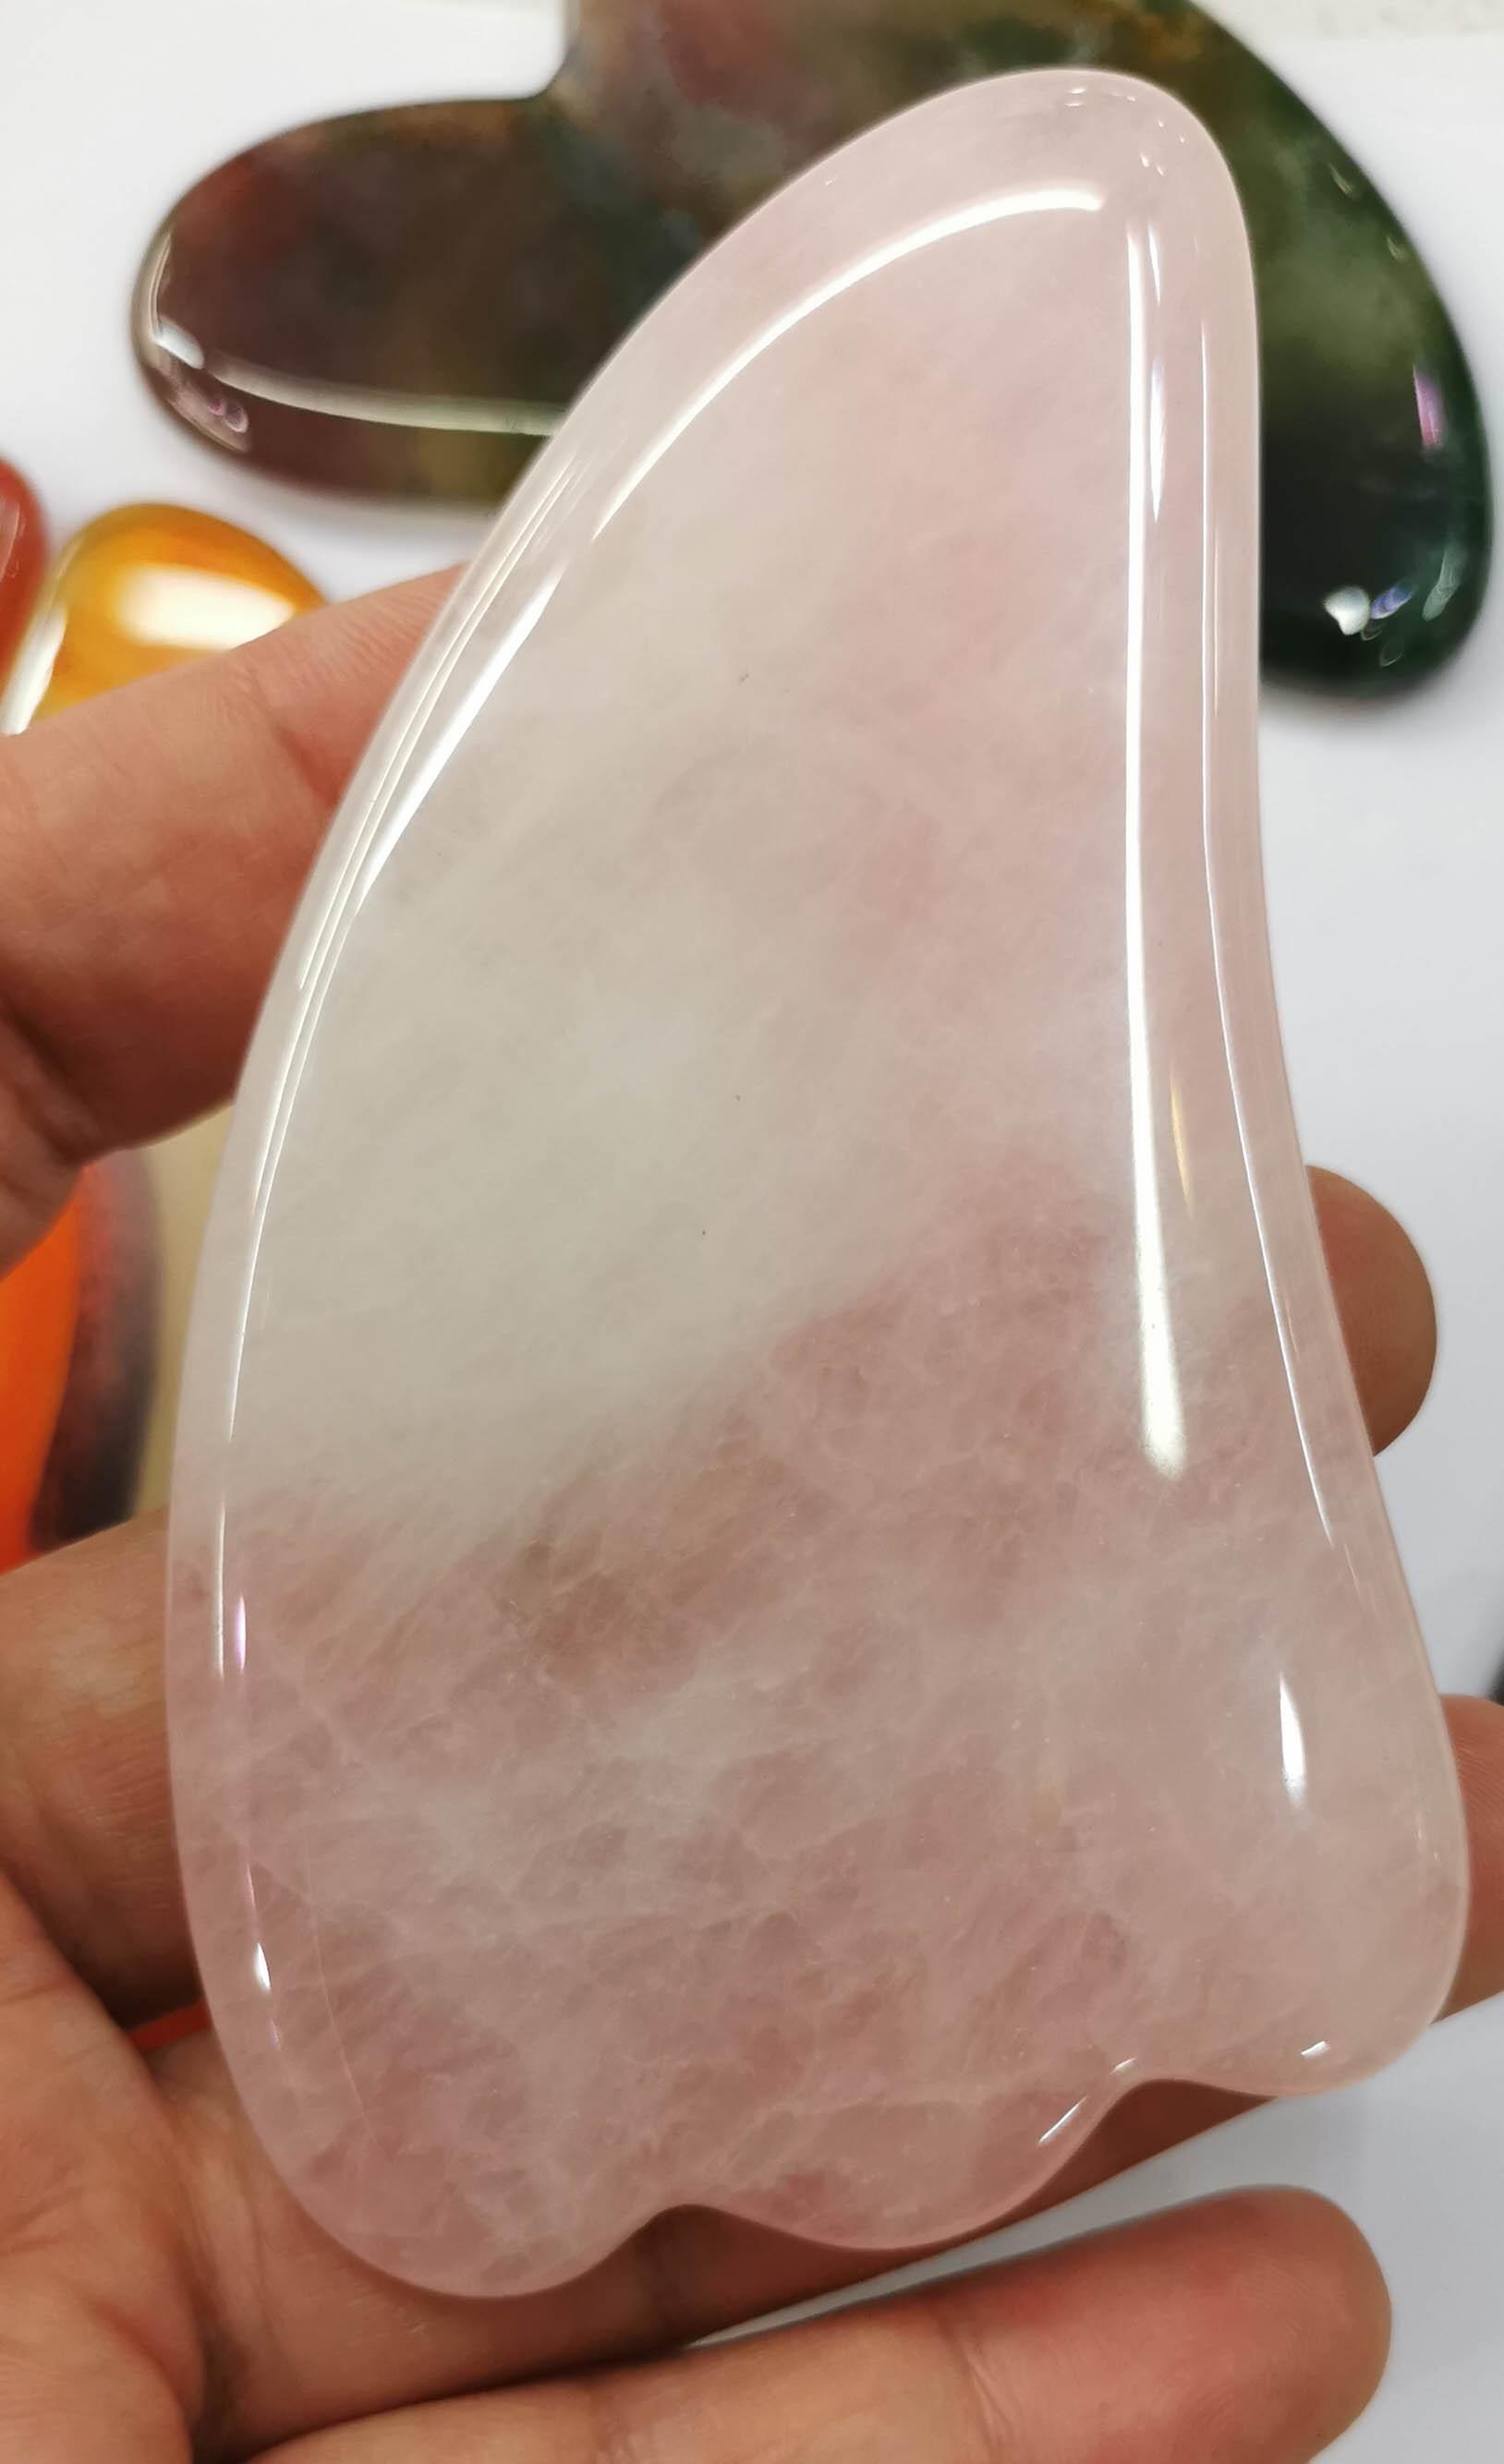 High Quality Genuine Rose Quartz Gua Sha Tool-onyx-agate-indian Agate Gemstone Stone Handmade